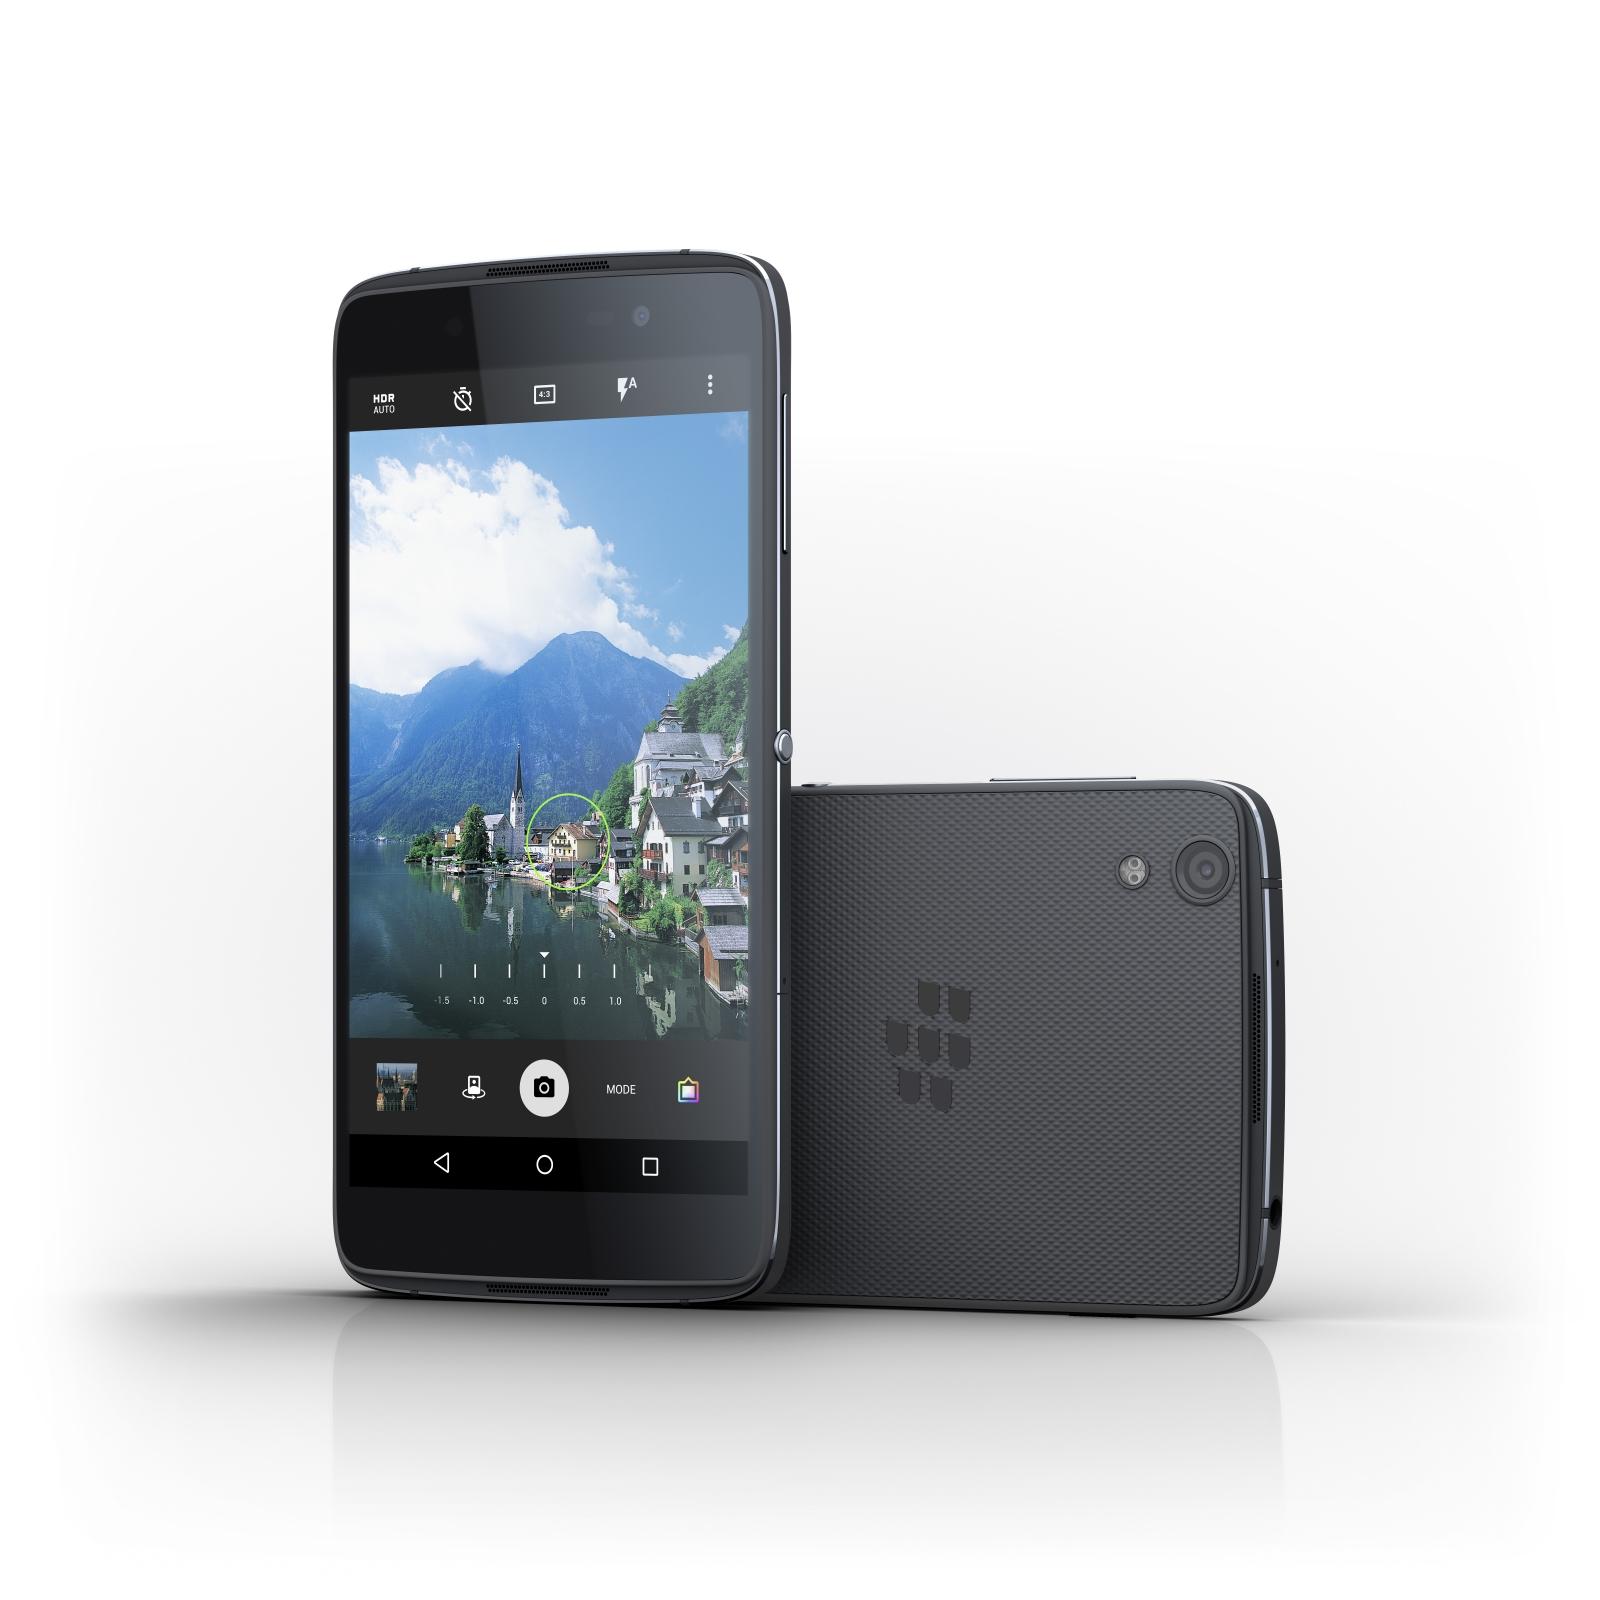 BlackBerry DTEK50 world's most secure Android smartphone